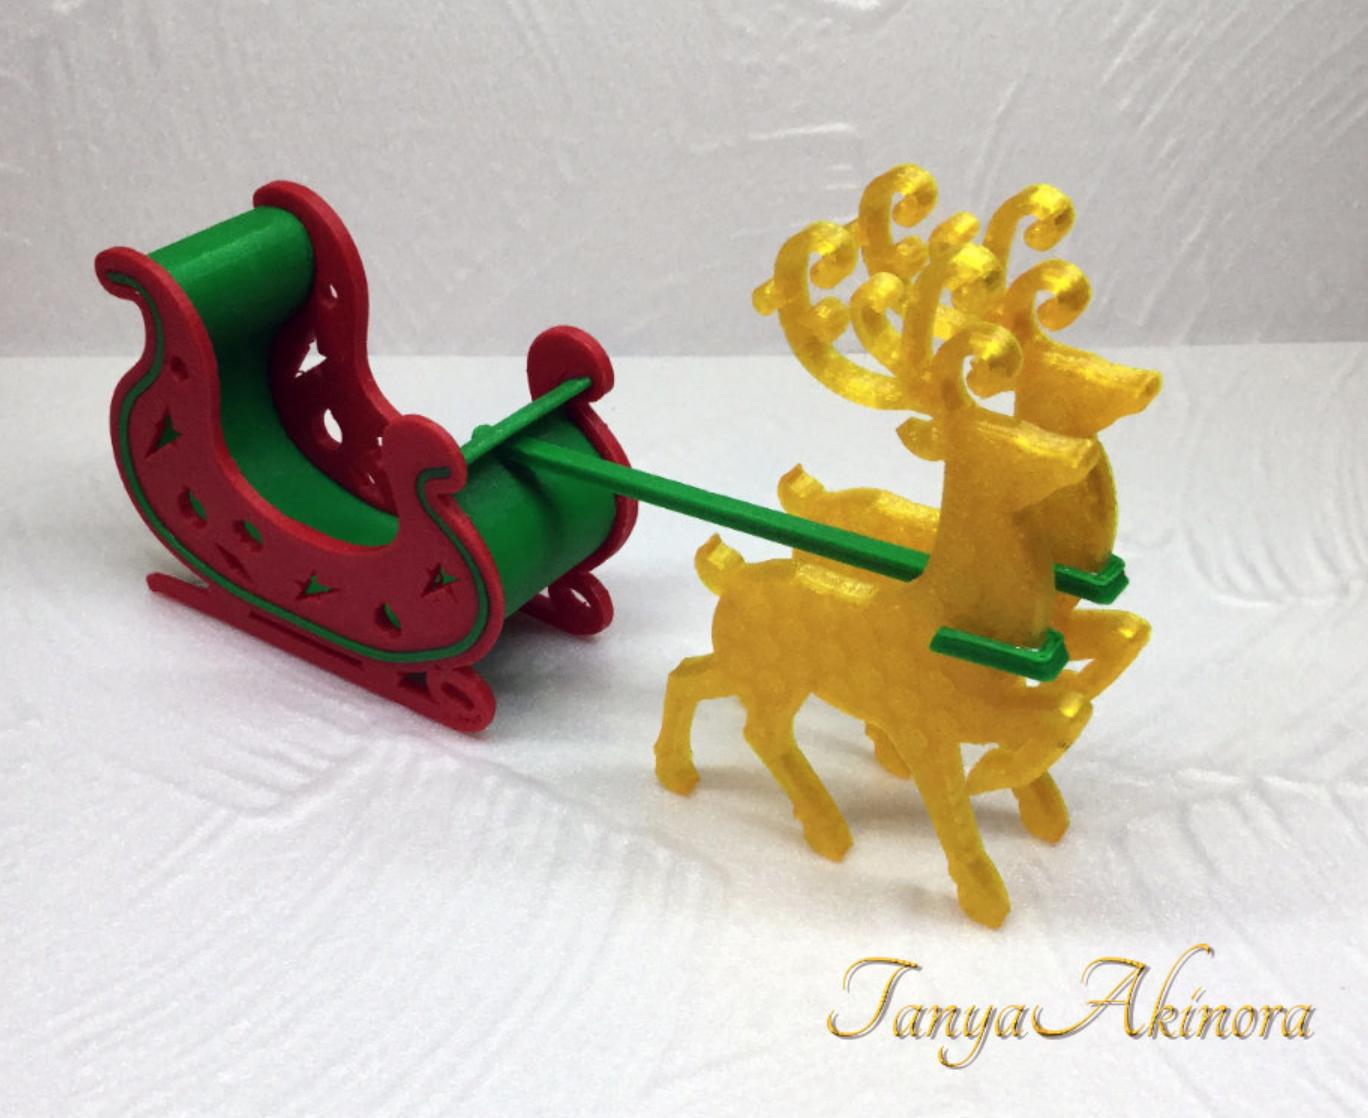 Capture d'écran 2017-12-12 à 17.19.27.png Download free STL file Christmas deer • 3D print template, TanyaAkinora